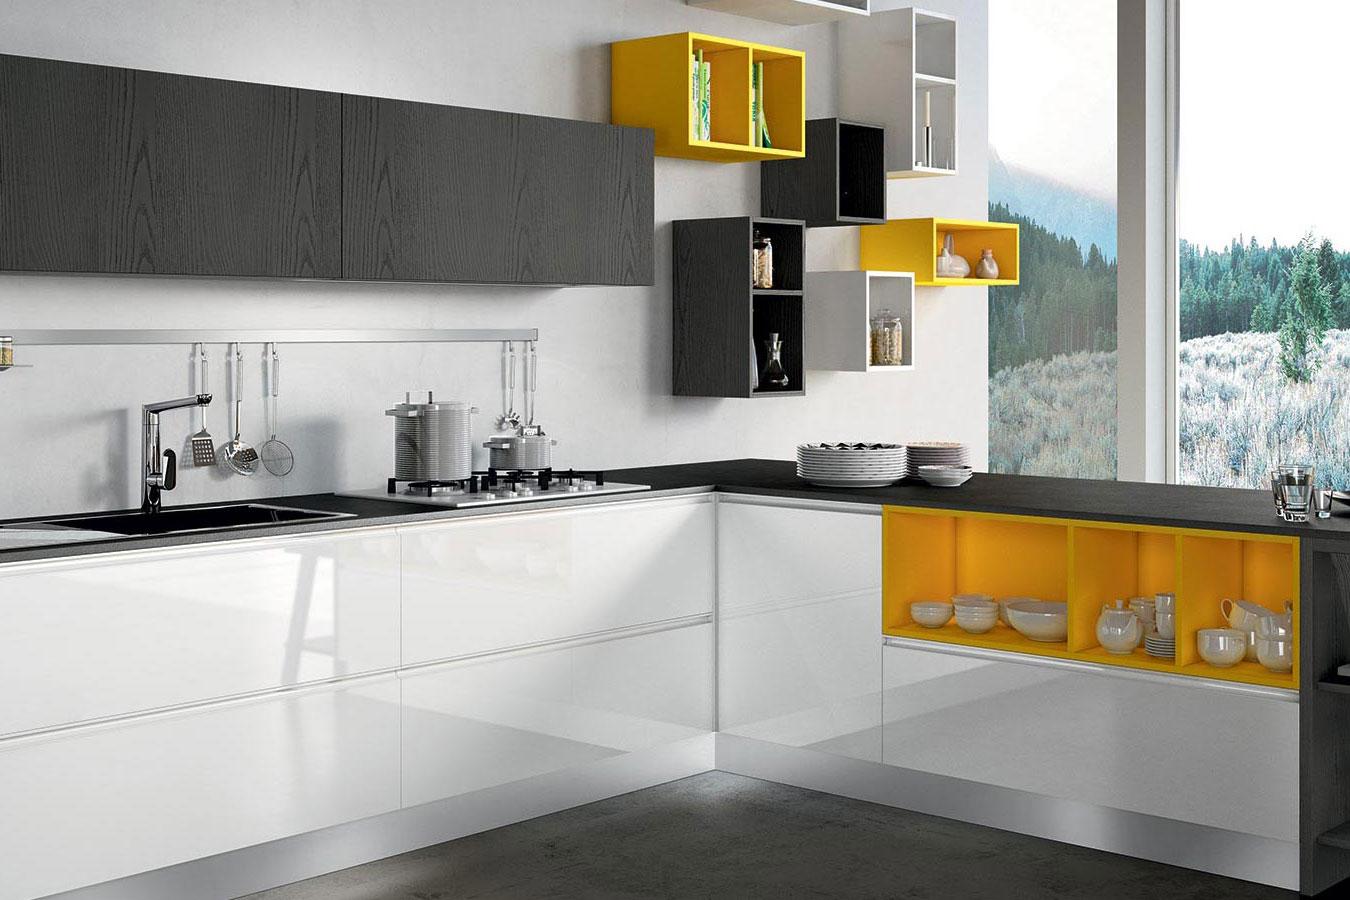 Cucine Bianco Grigio : Arredo cucina moon duna moderna design bianco grigio giallo